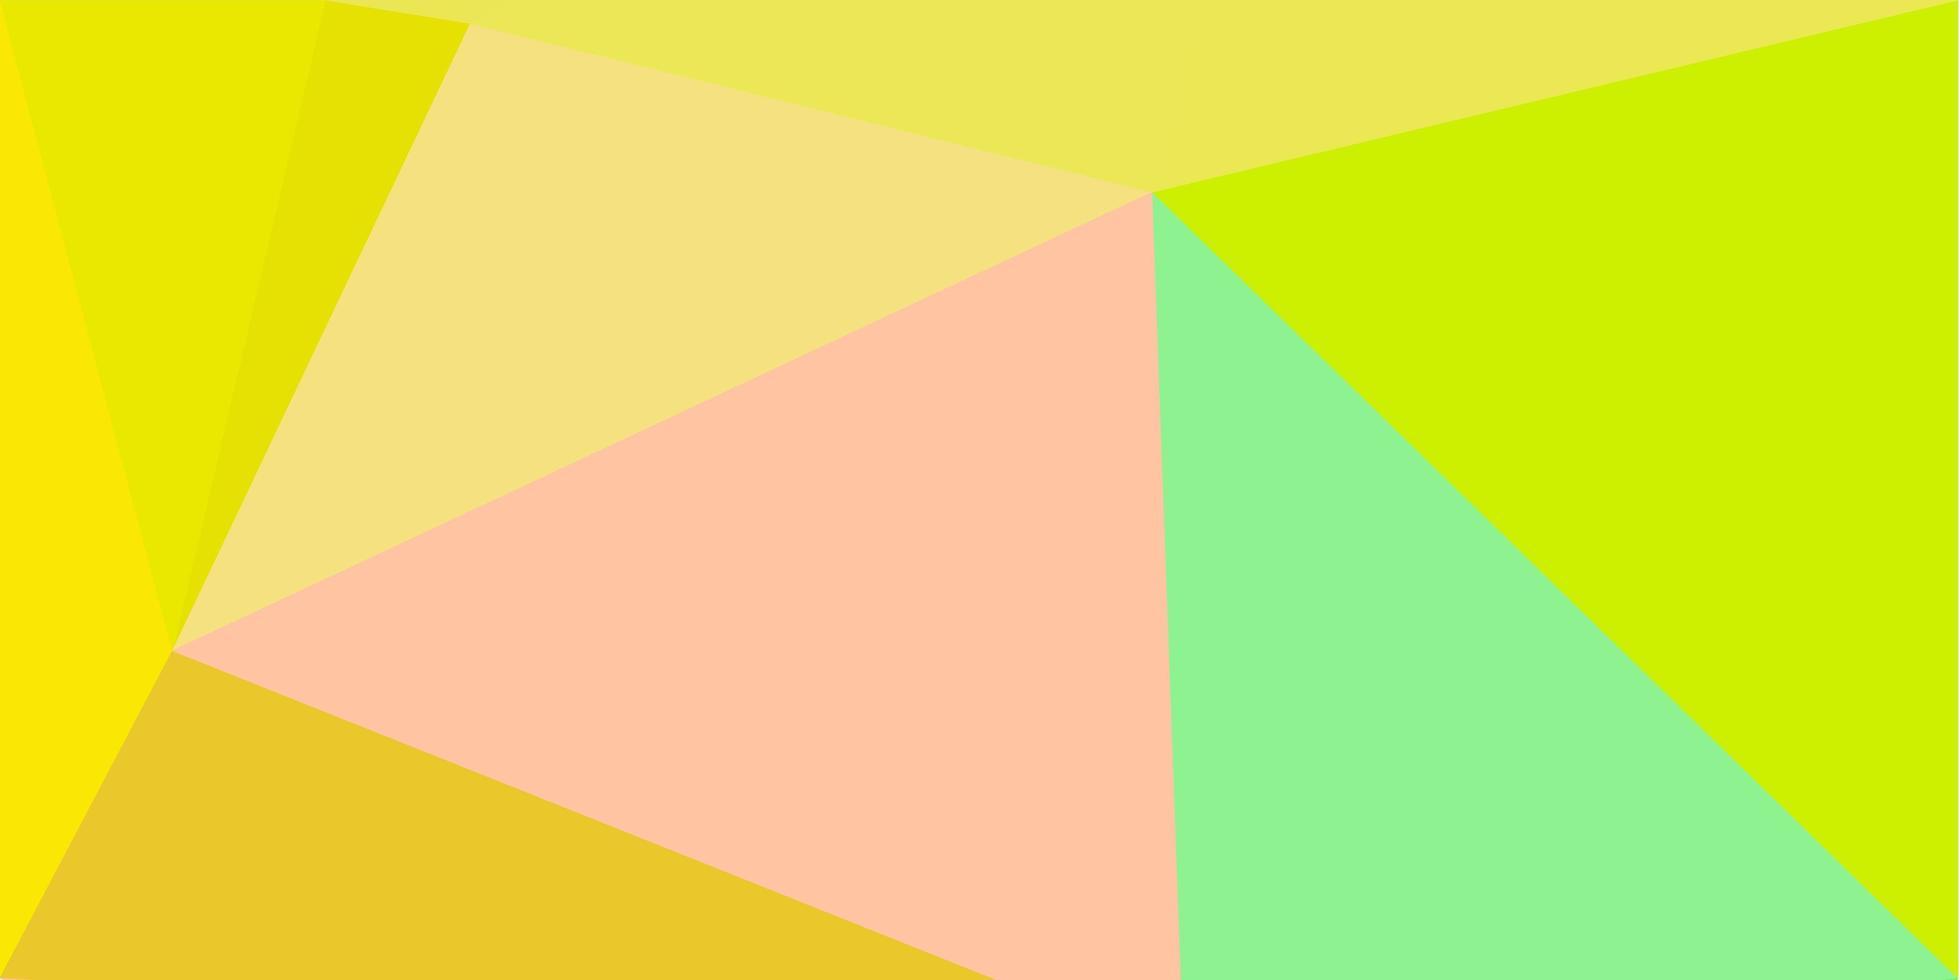 fond polygonale de vecteur vert clair, rouge.